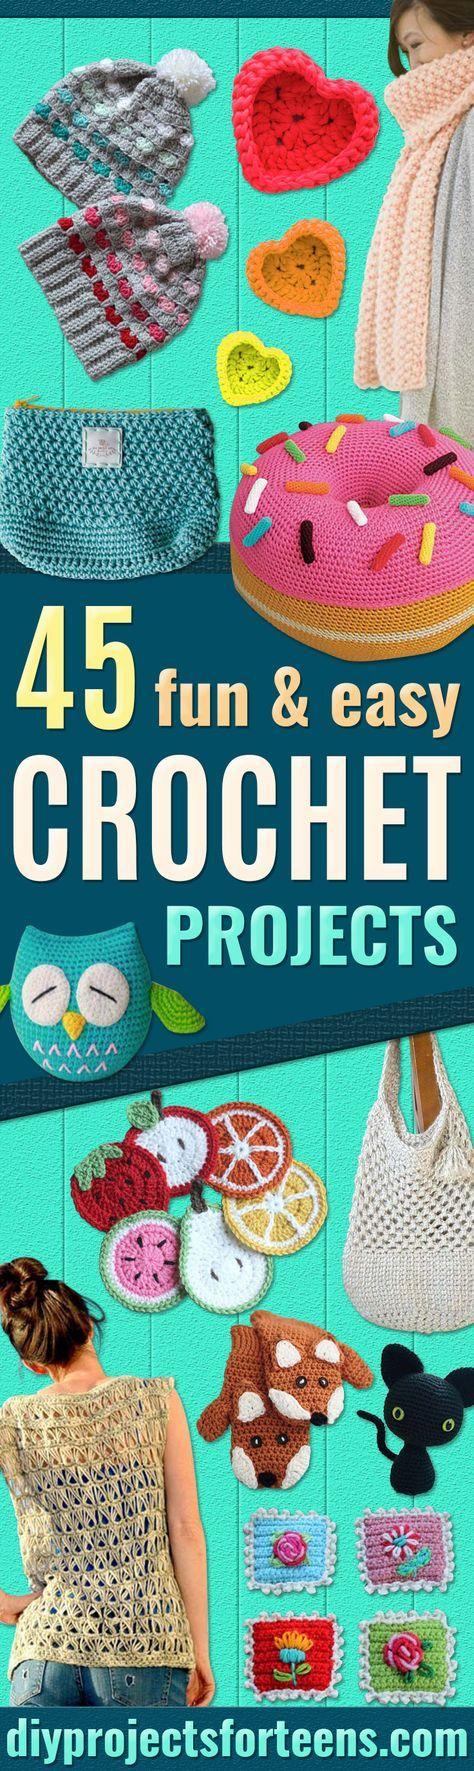 45 Fun and Easy Crochet Projects | Pinterest | Ganchillo, Tejido y Cosas